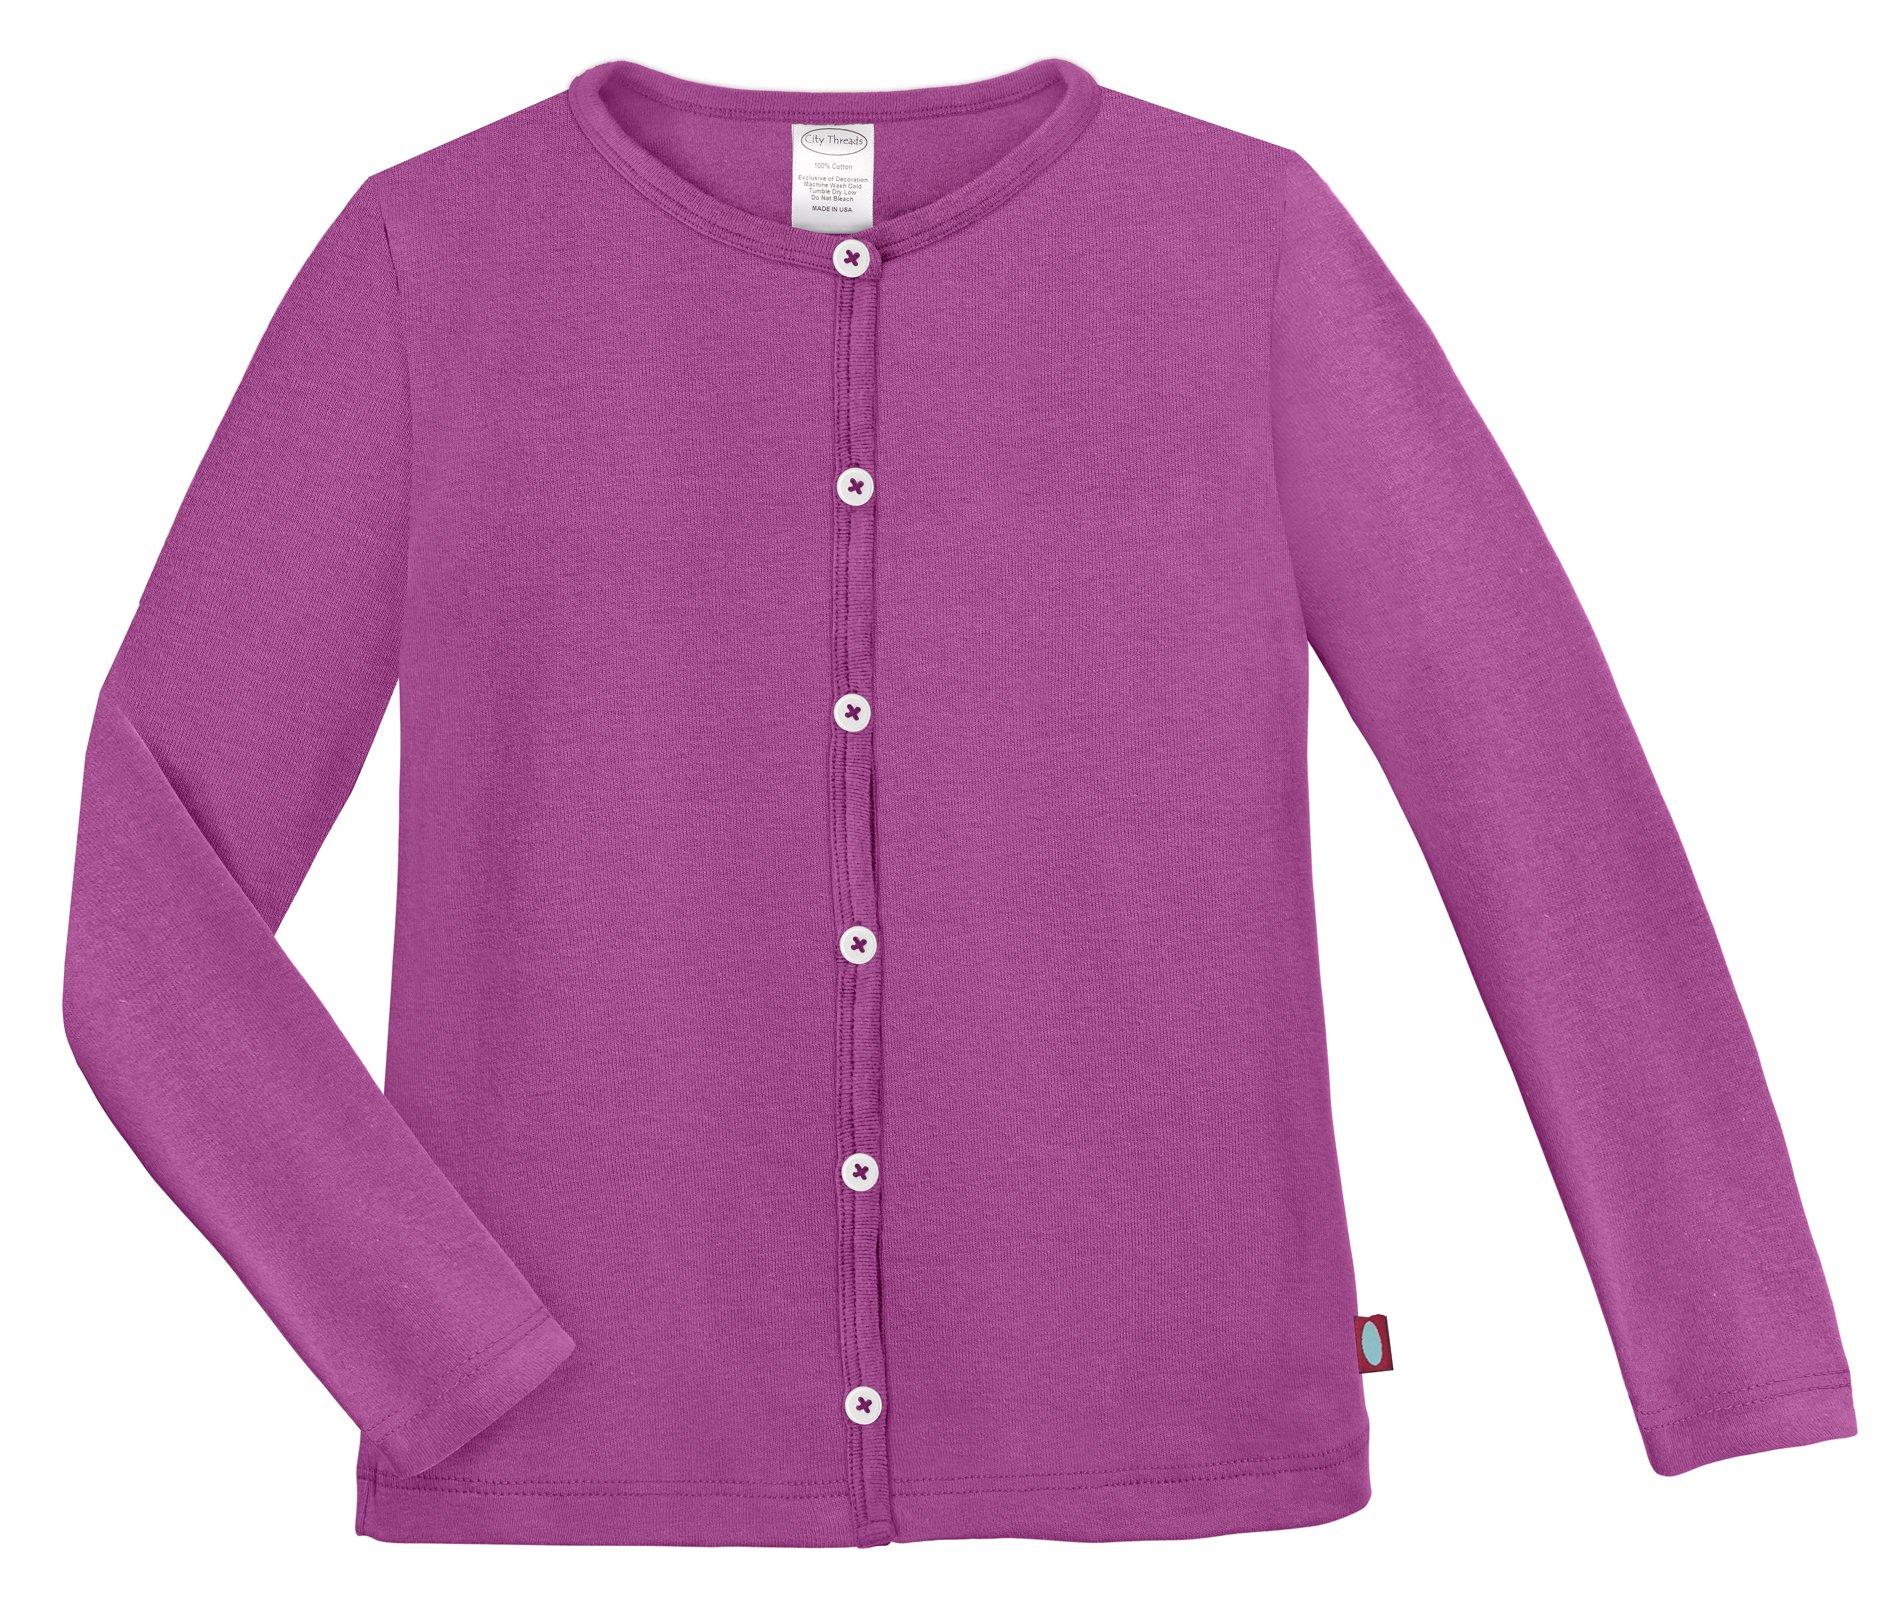 City Threads Girls Cardigan Top Button Down Sweater Layering School Play for Sensitive Skin SPD Sensory Friendly, Plum, 10